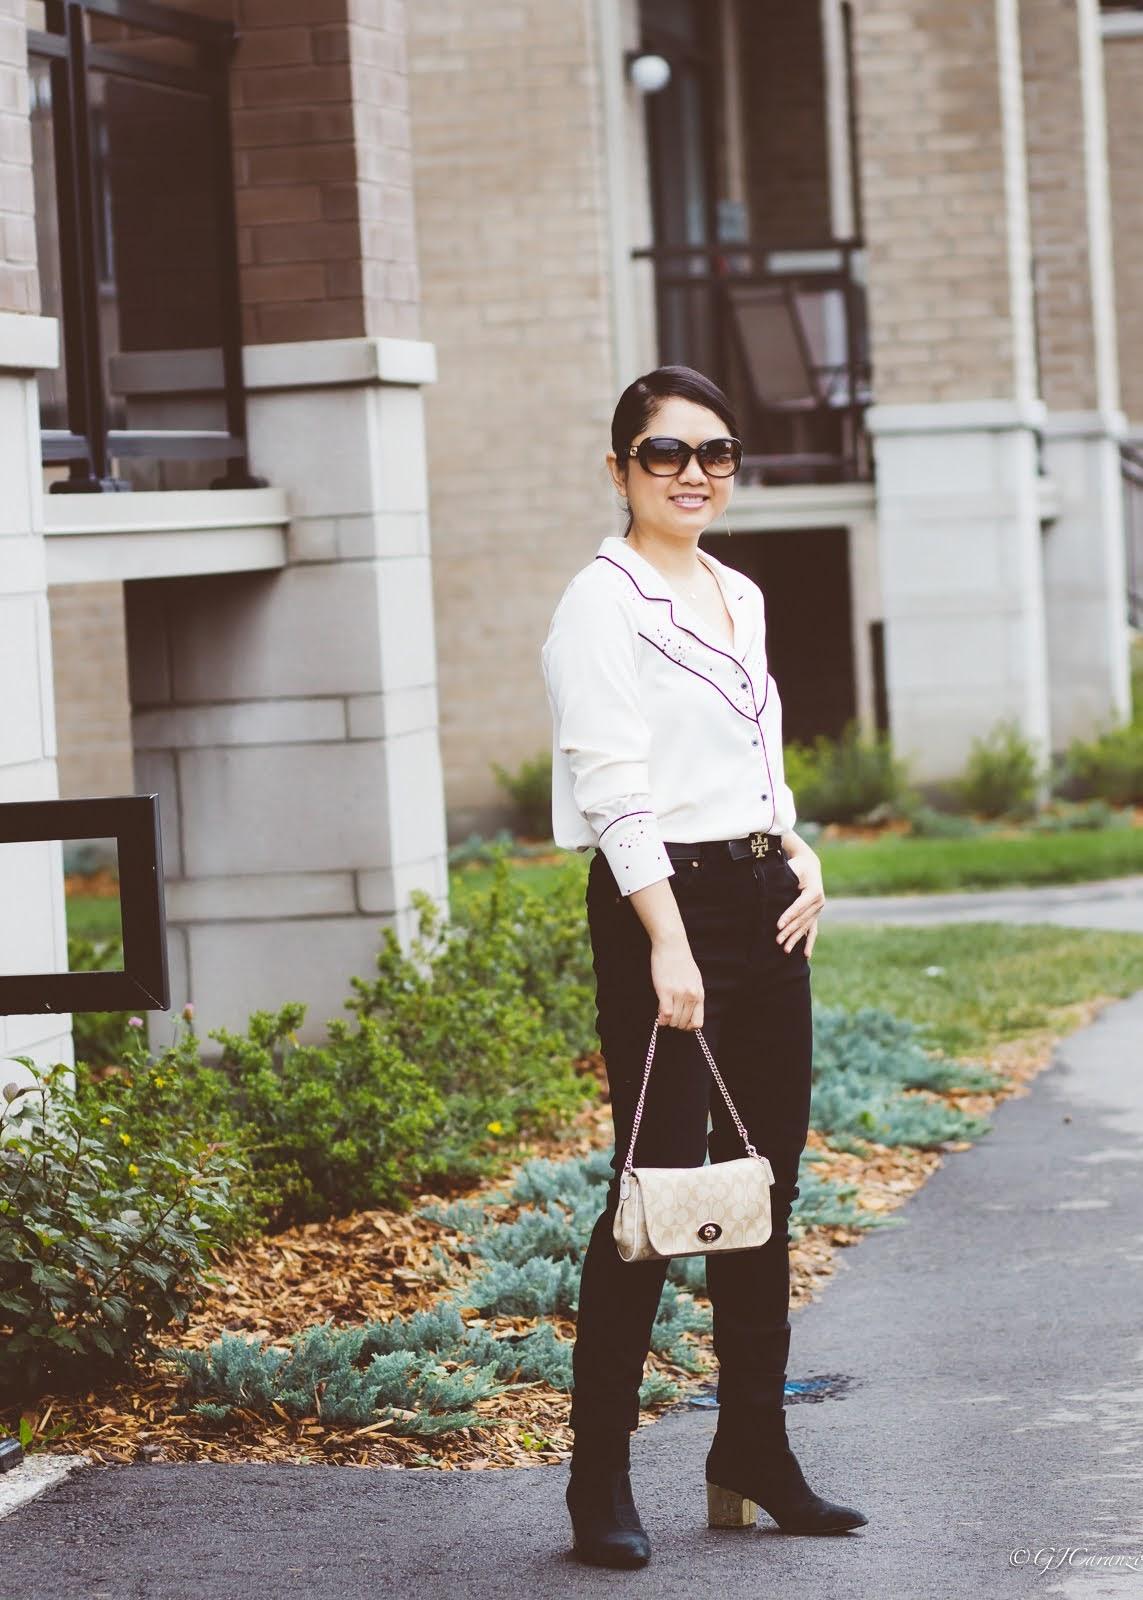 Zara Long Sleeve Pajama Shirt | Mango Black Jeans | Tory Burch Reversible Belt | Steve Madden Ankle Booties | Coach Bag | Petite Outfit | Mom Style